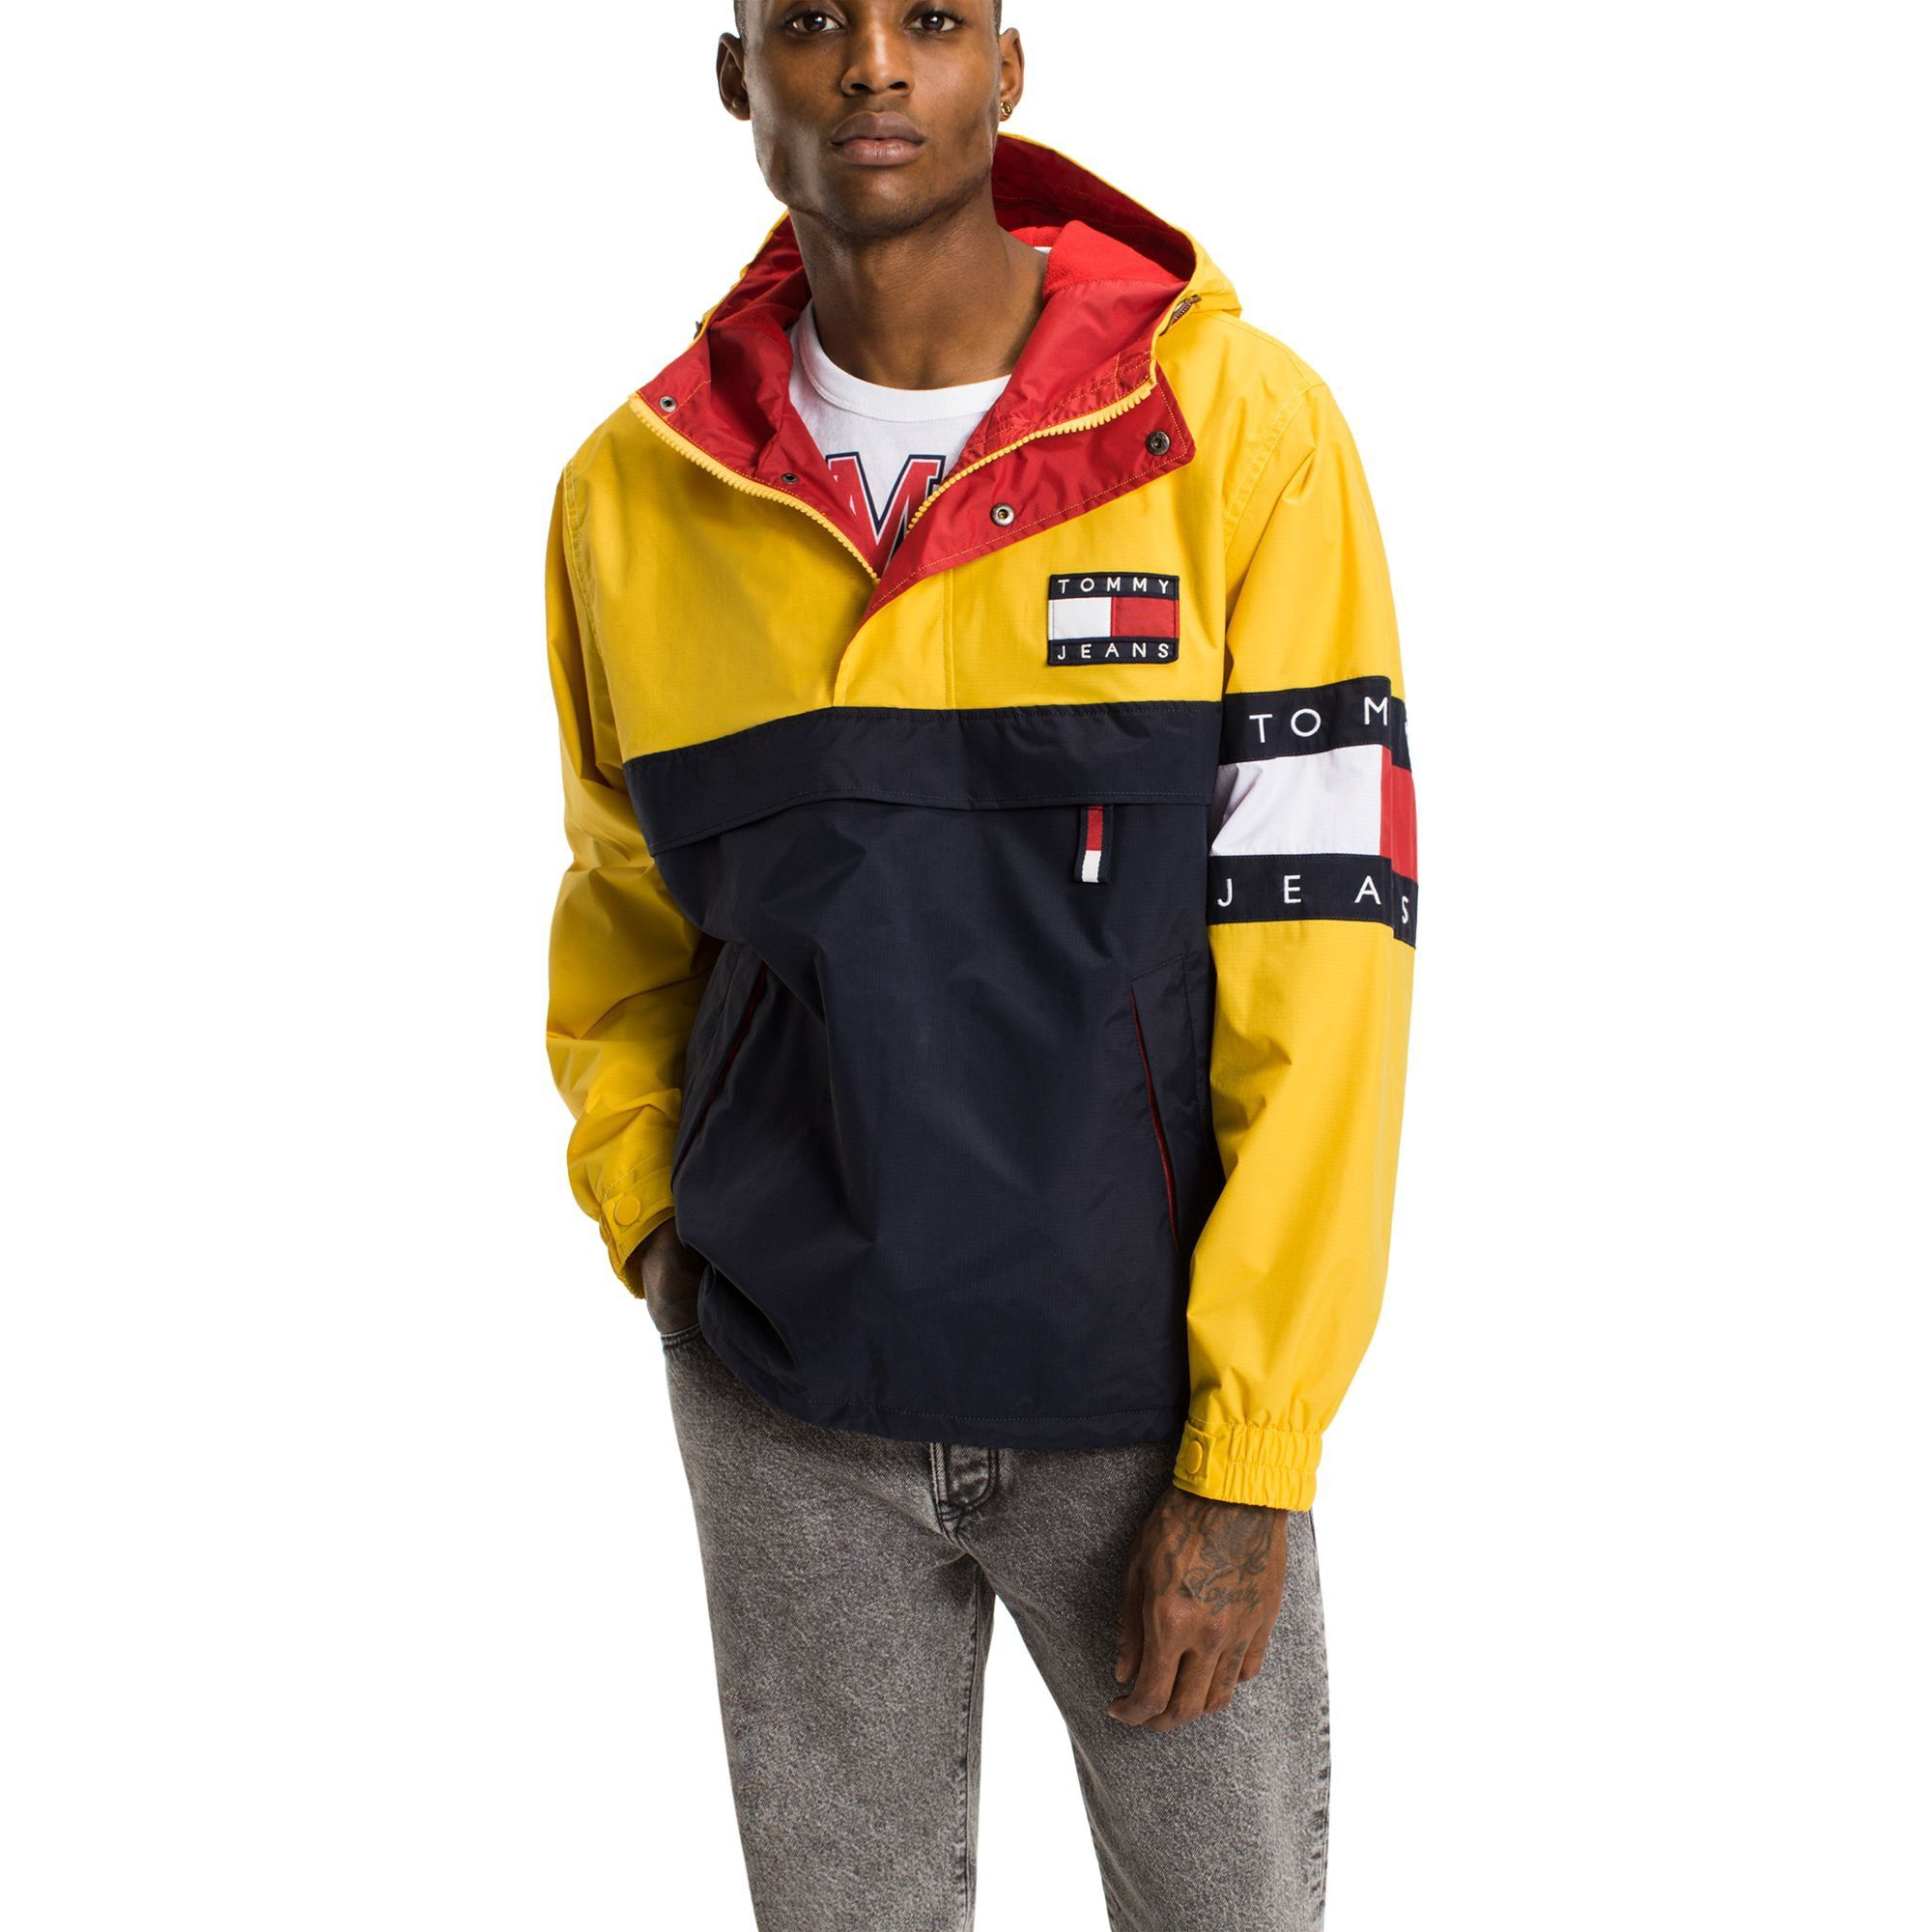 Tommy Jeans Classics Retro Jacket Surf The Web Multi | 5Pointz